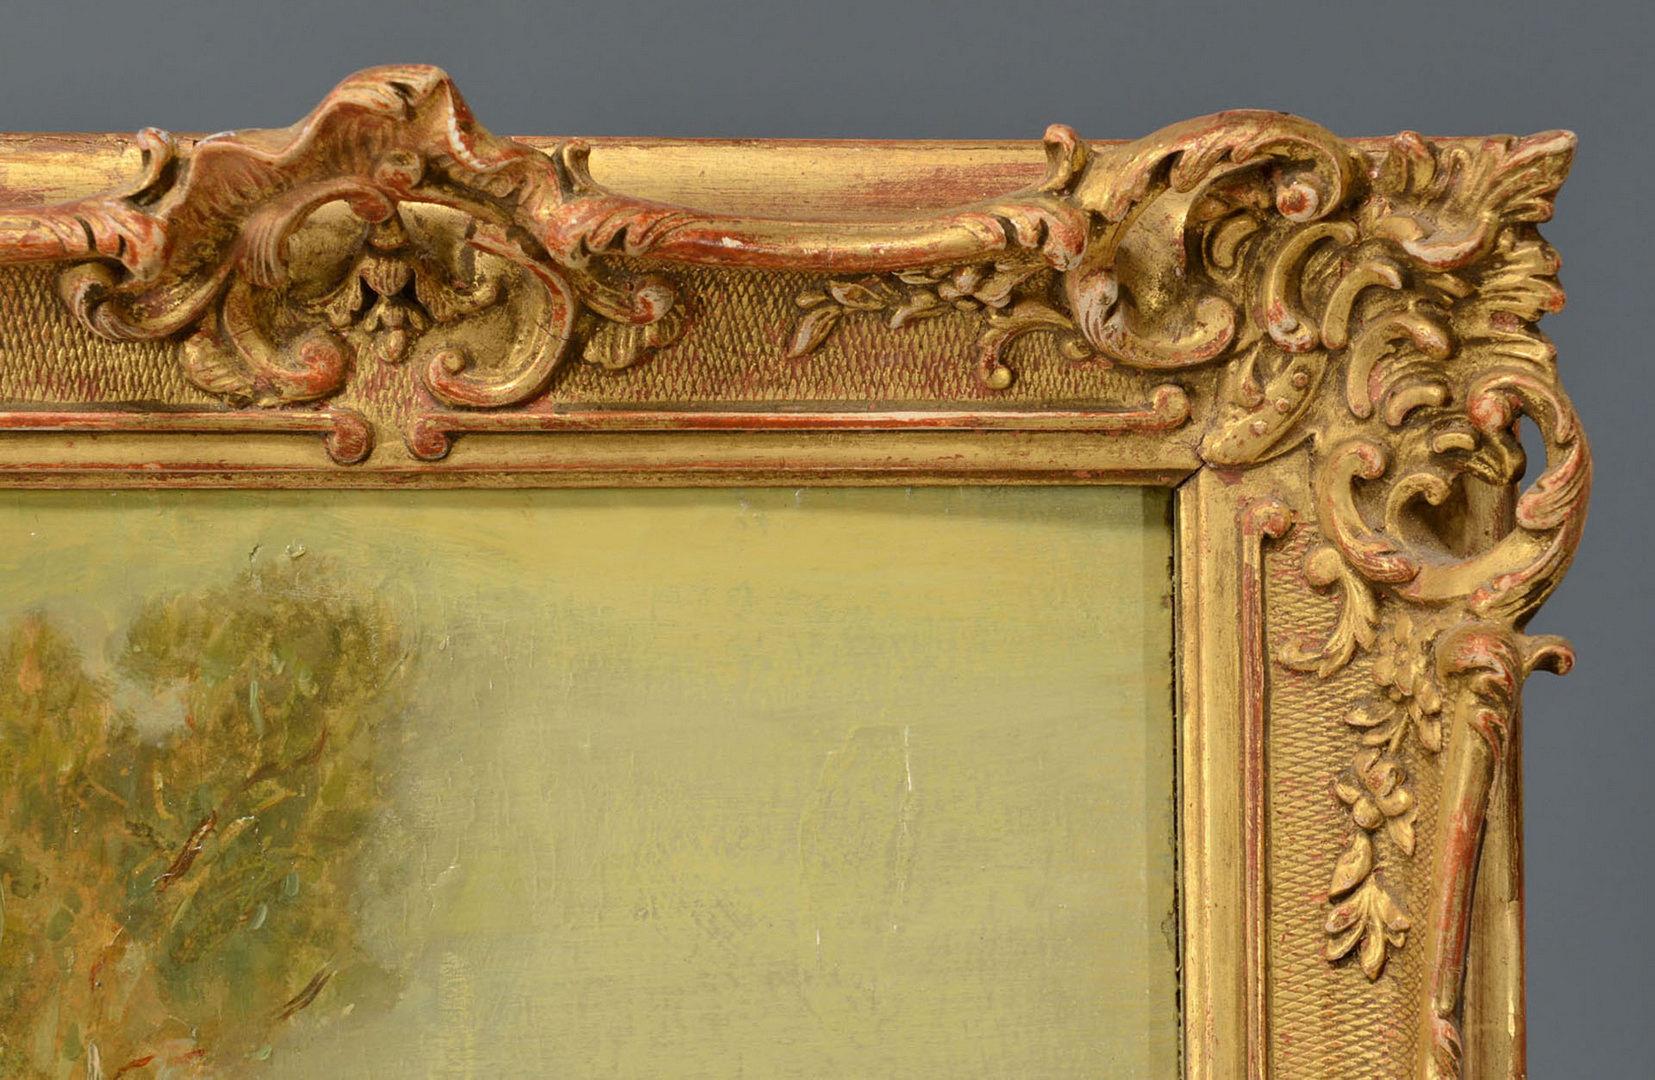 Lot 358: Pr. French Genre Paintings, attrib. Castaigne